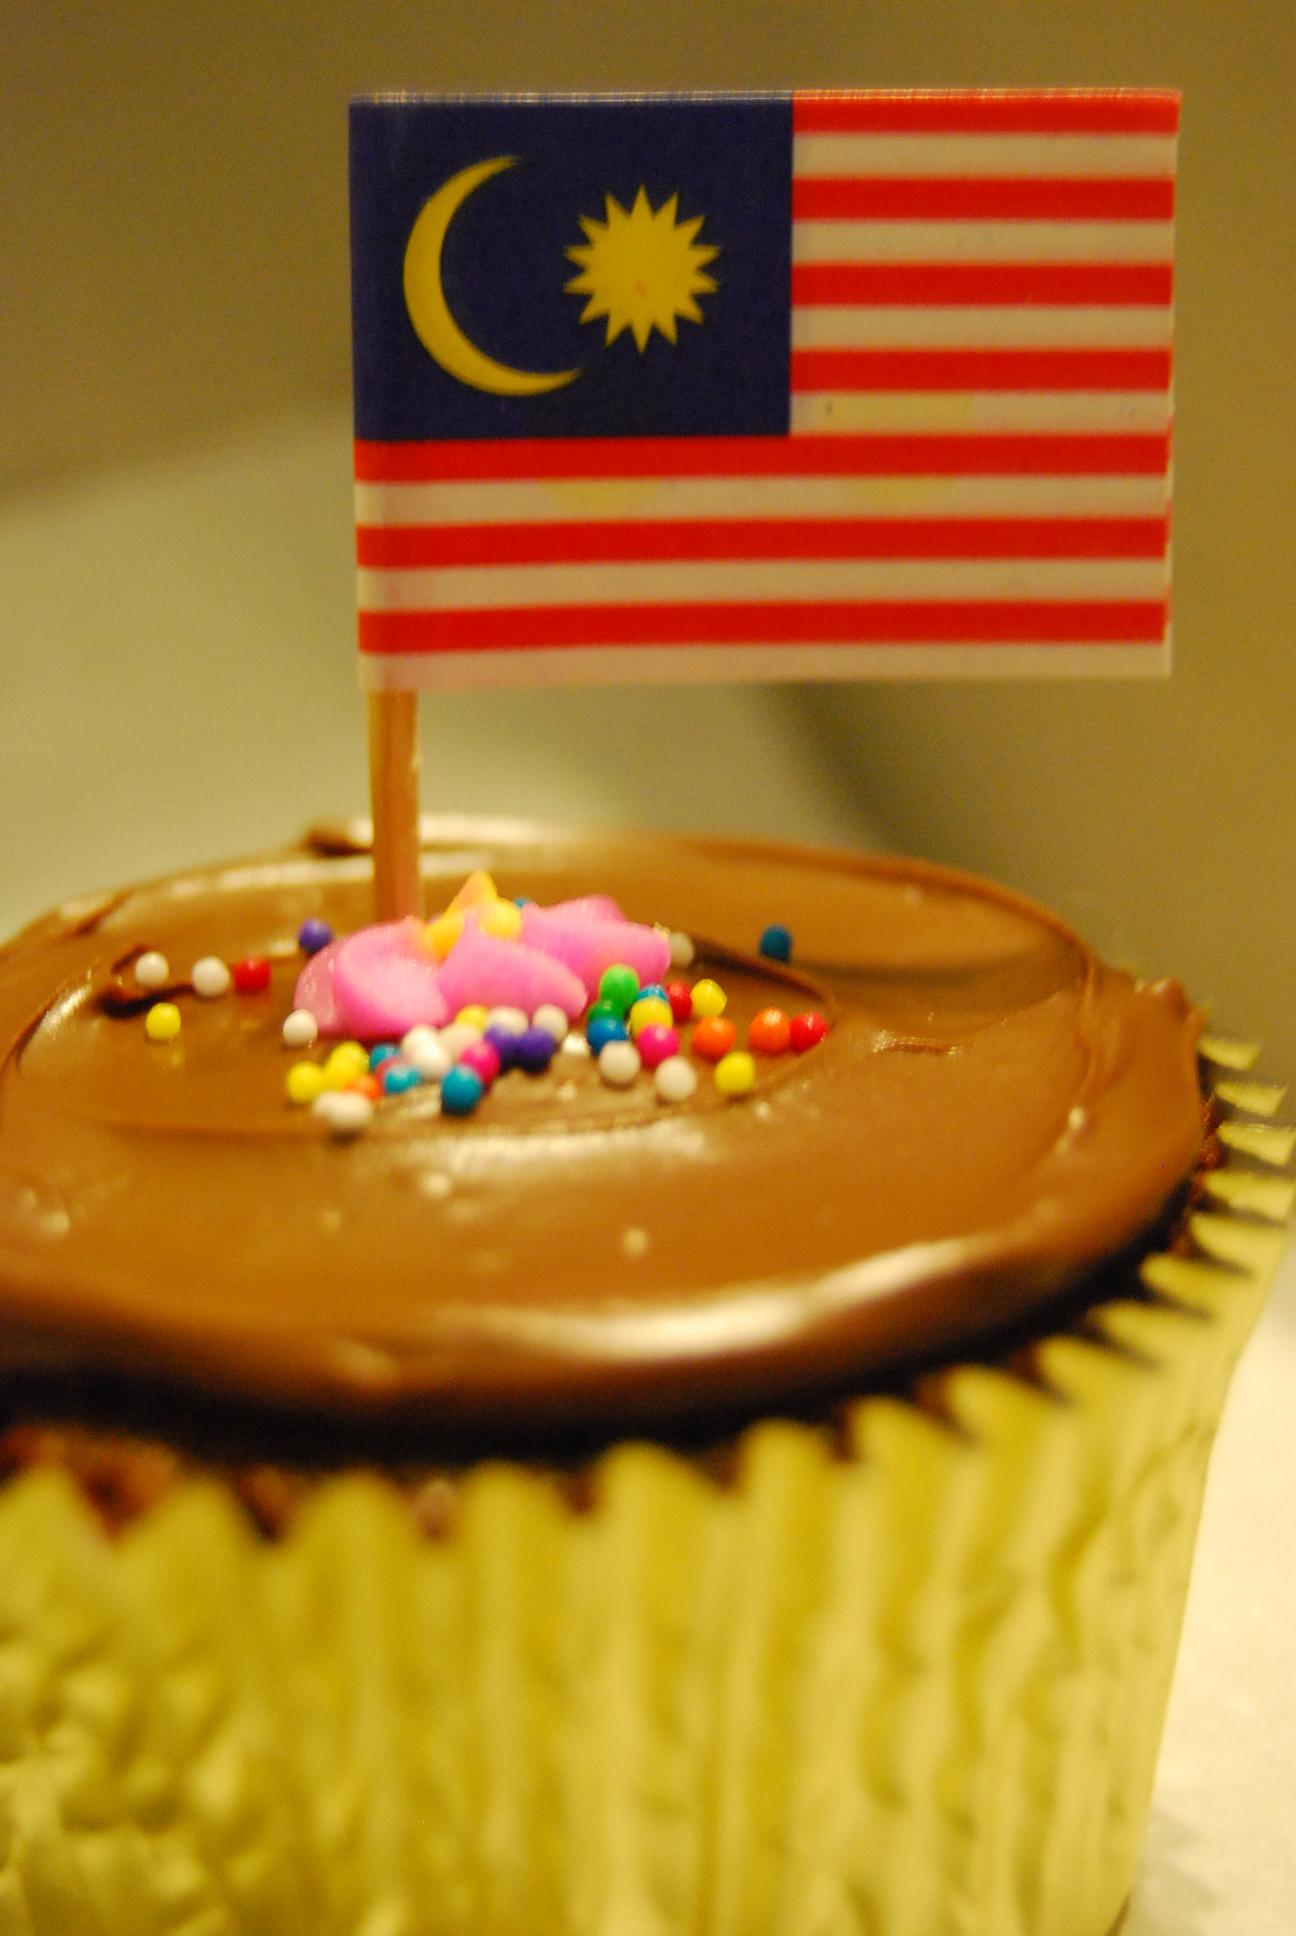 Happy 50th birthday, Malaysia!